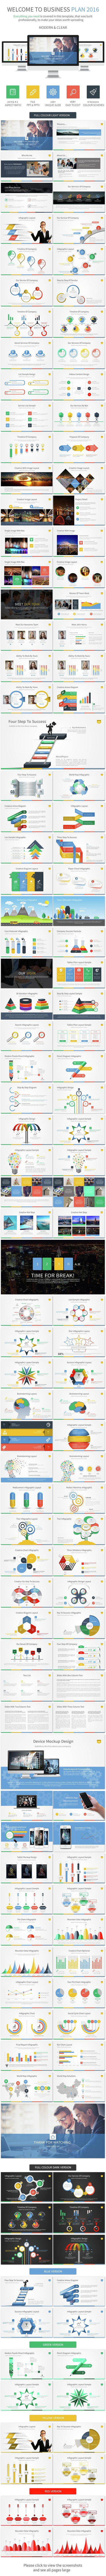 Business Plan 2016 Powerpoint Presentation Template - Business PowerPoint Templates